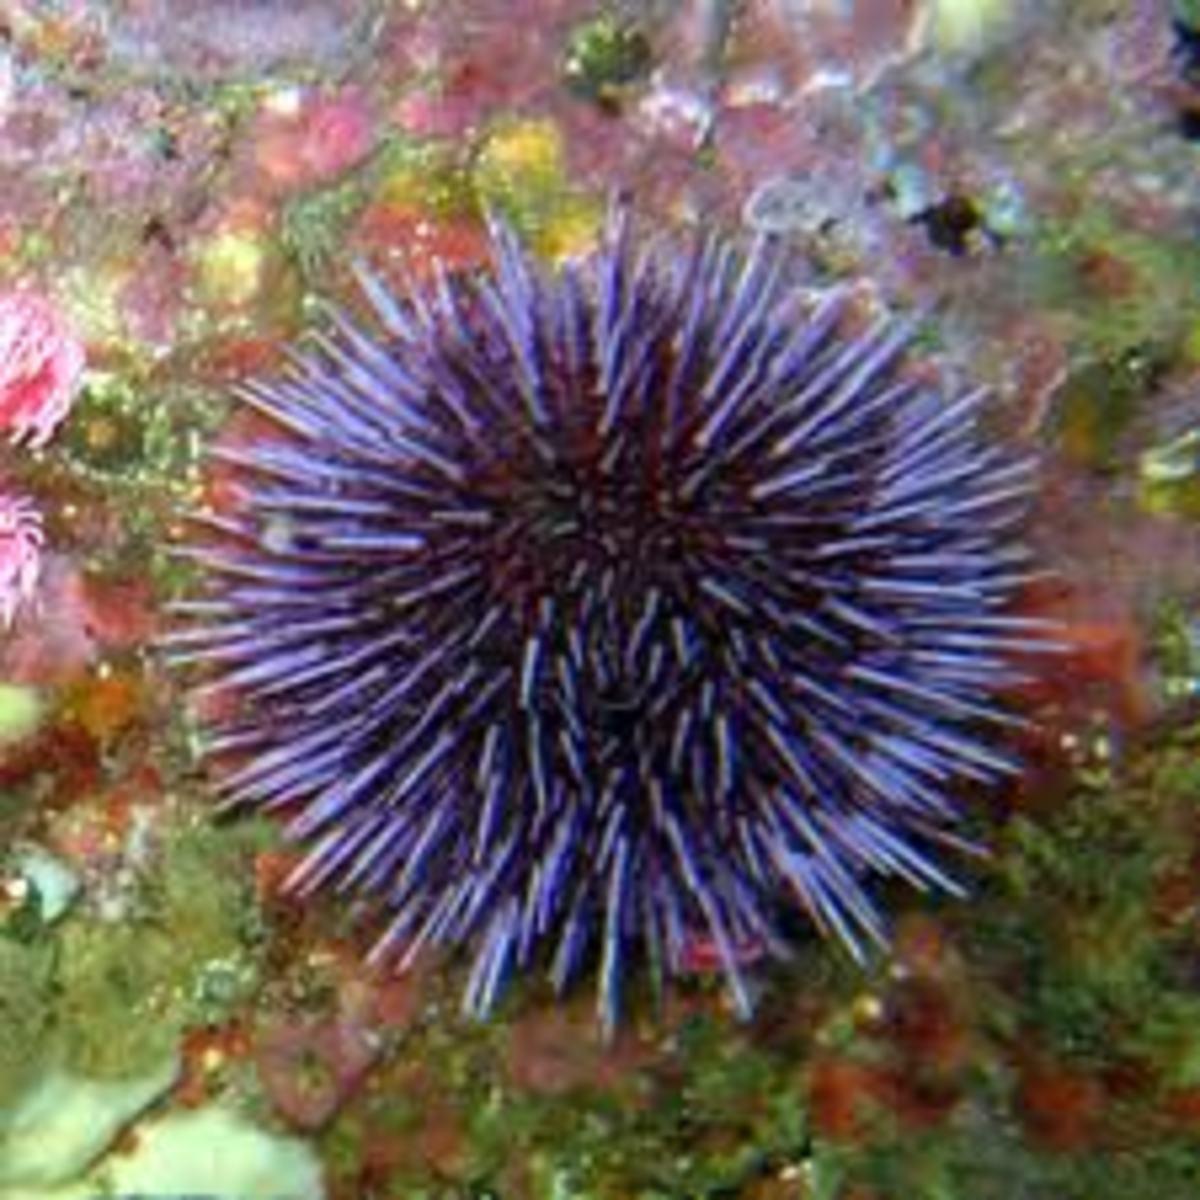 a purple sea urchin